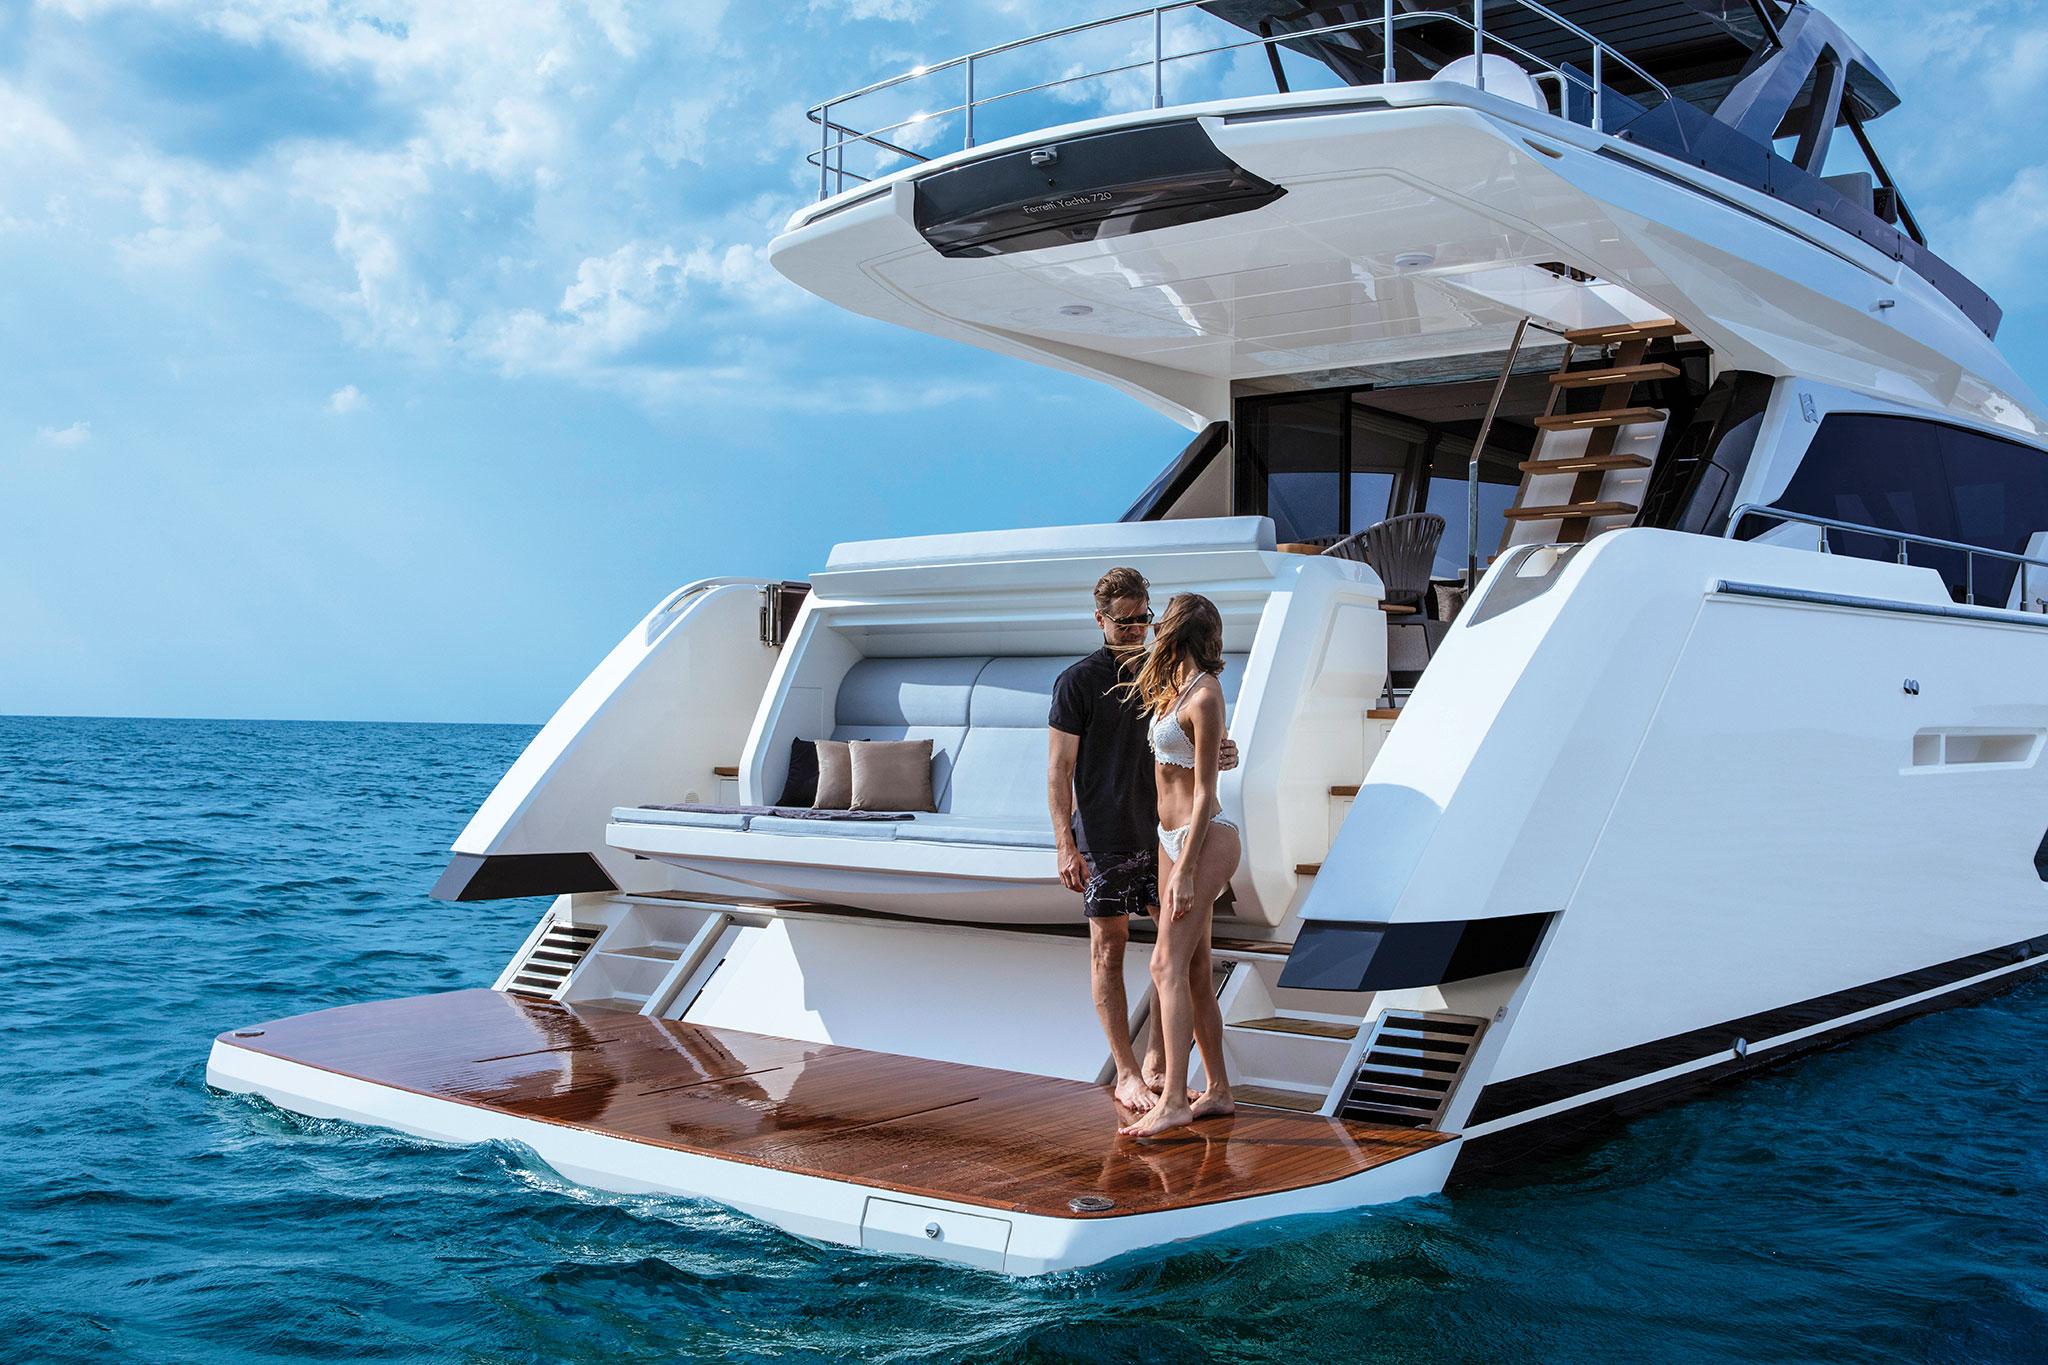 ferretti-Yachts-720-floating-platform-yachts-france-173